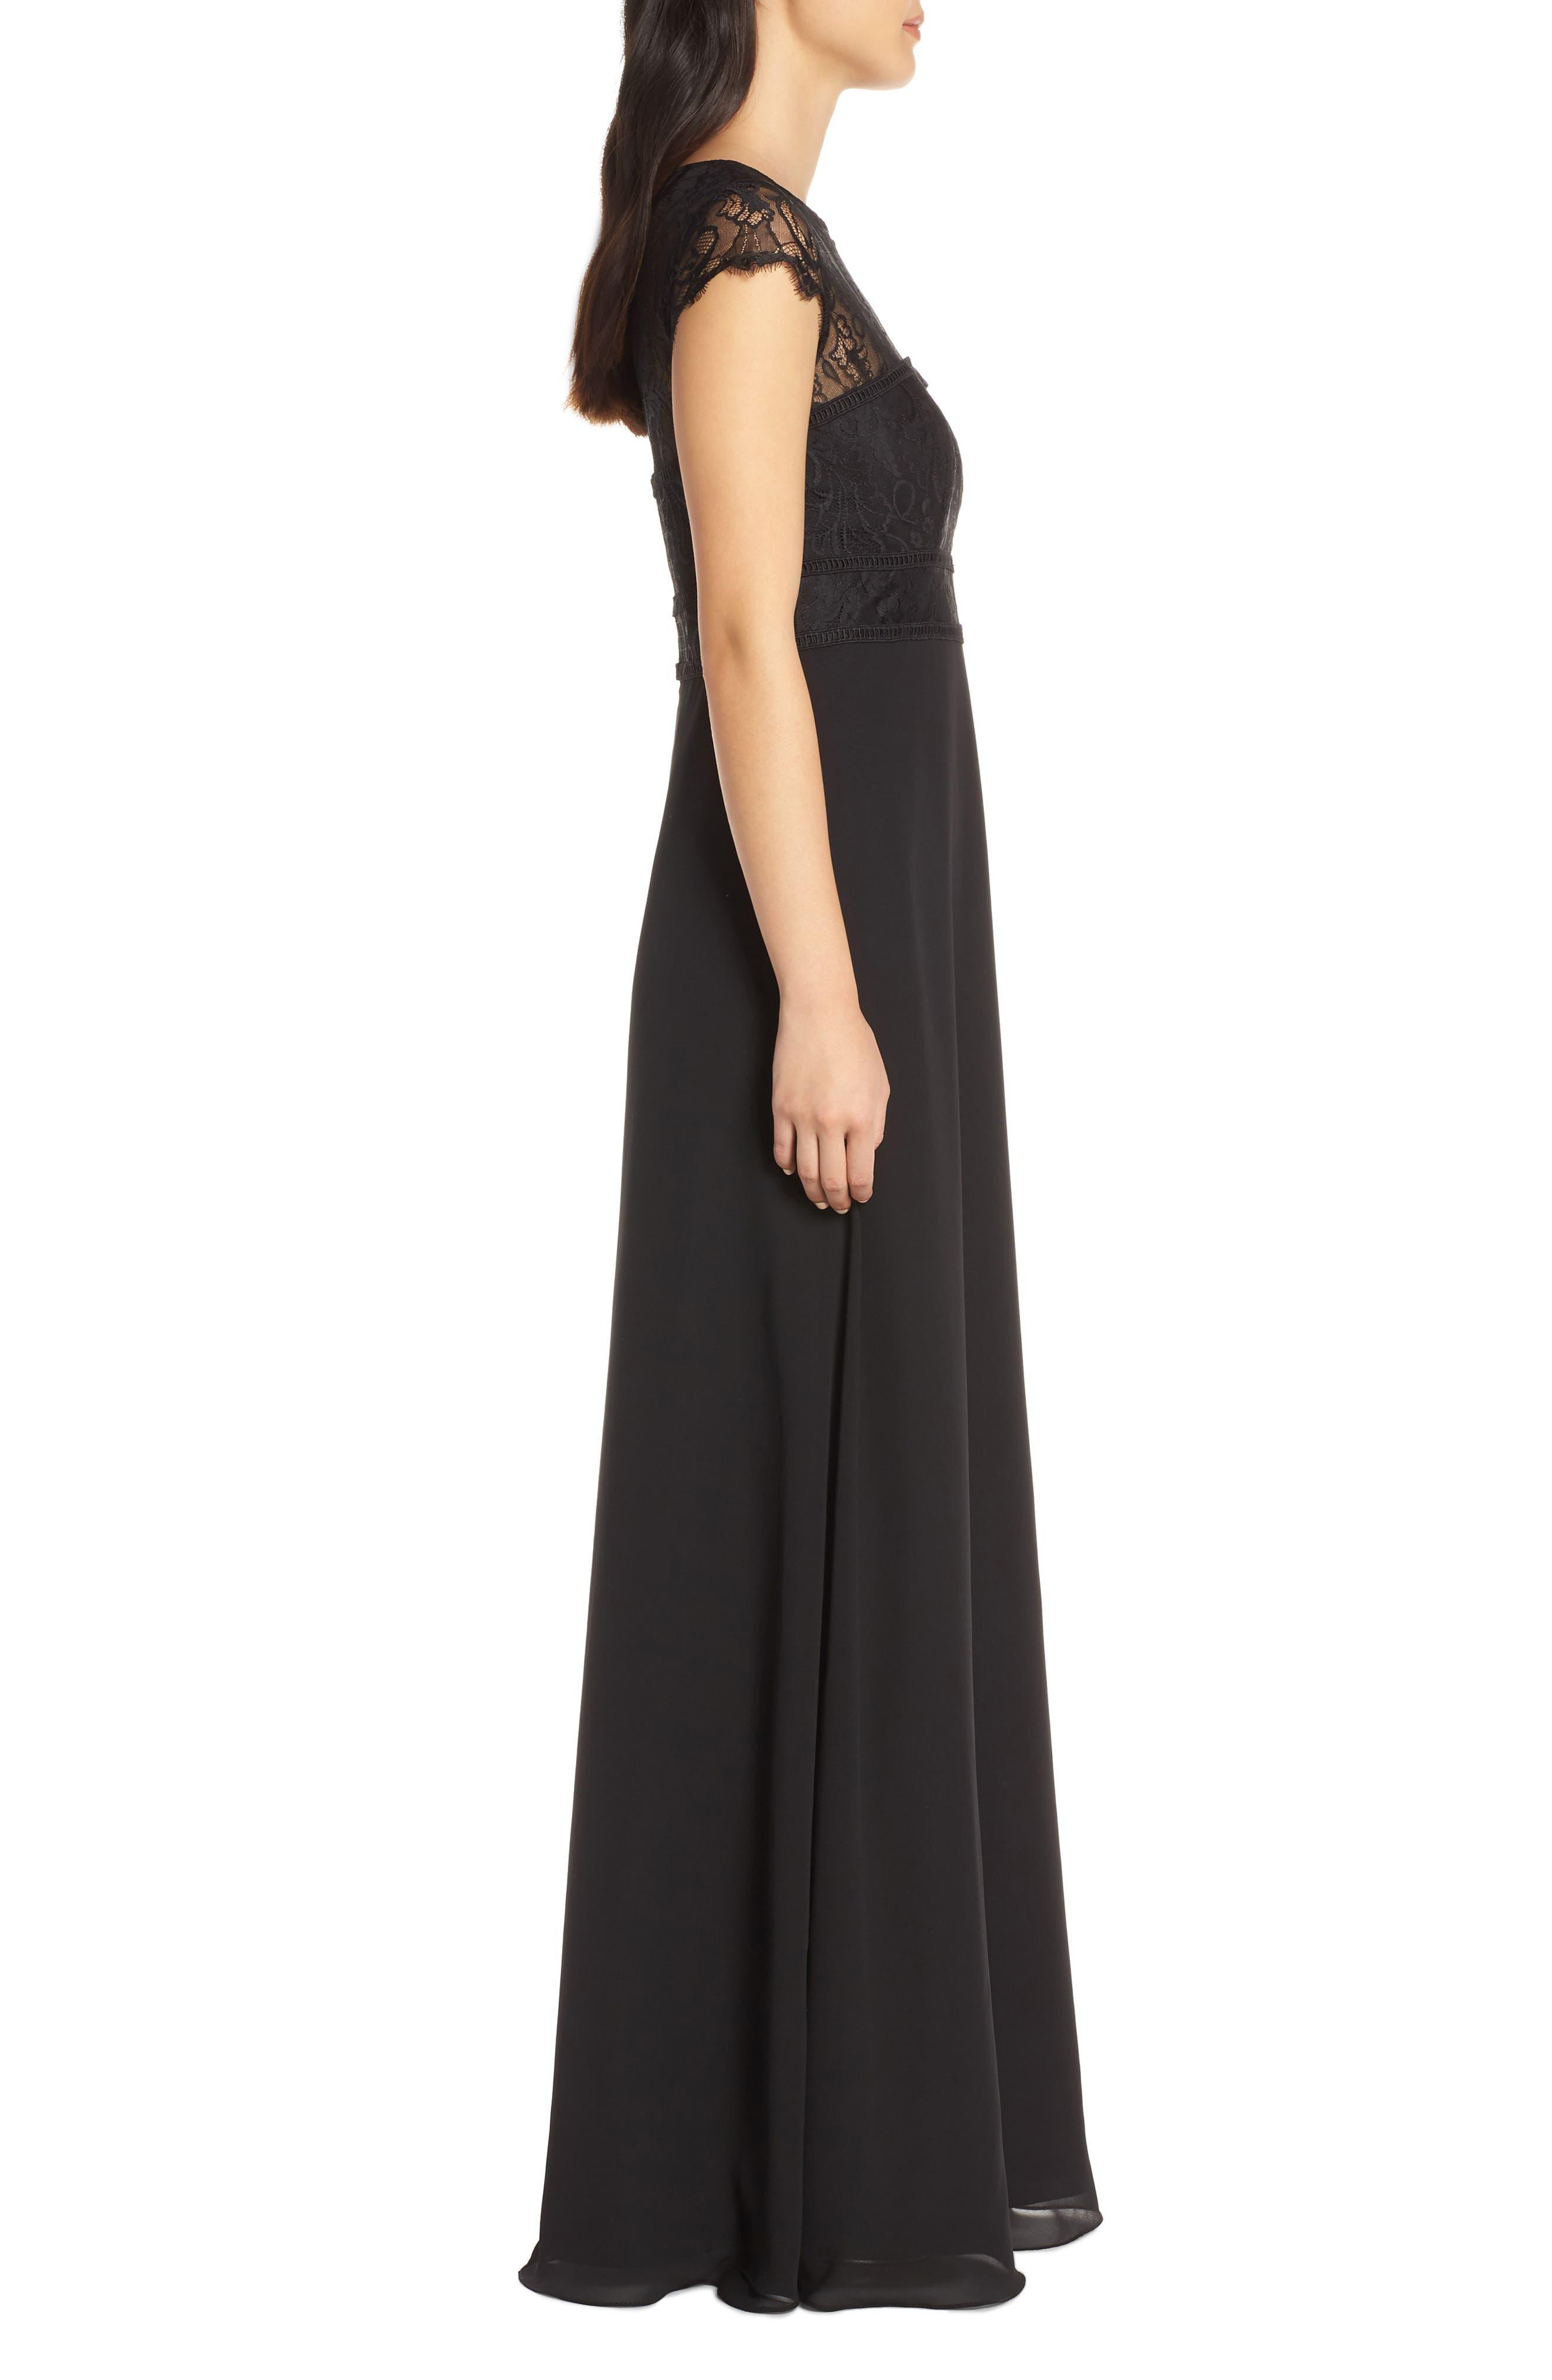 HAYLEY PAIGE OCCASIONS,                             Lace Bodice Chiffon Evening Dress,                             Alternate thumbnail 3, color,                             BLACK / BLACK